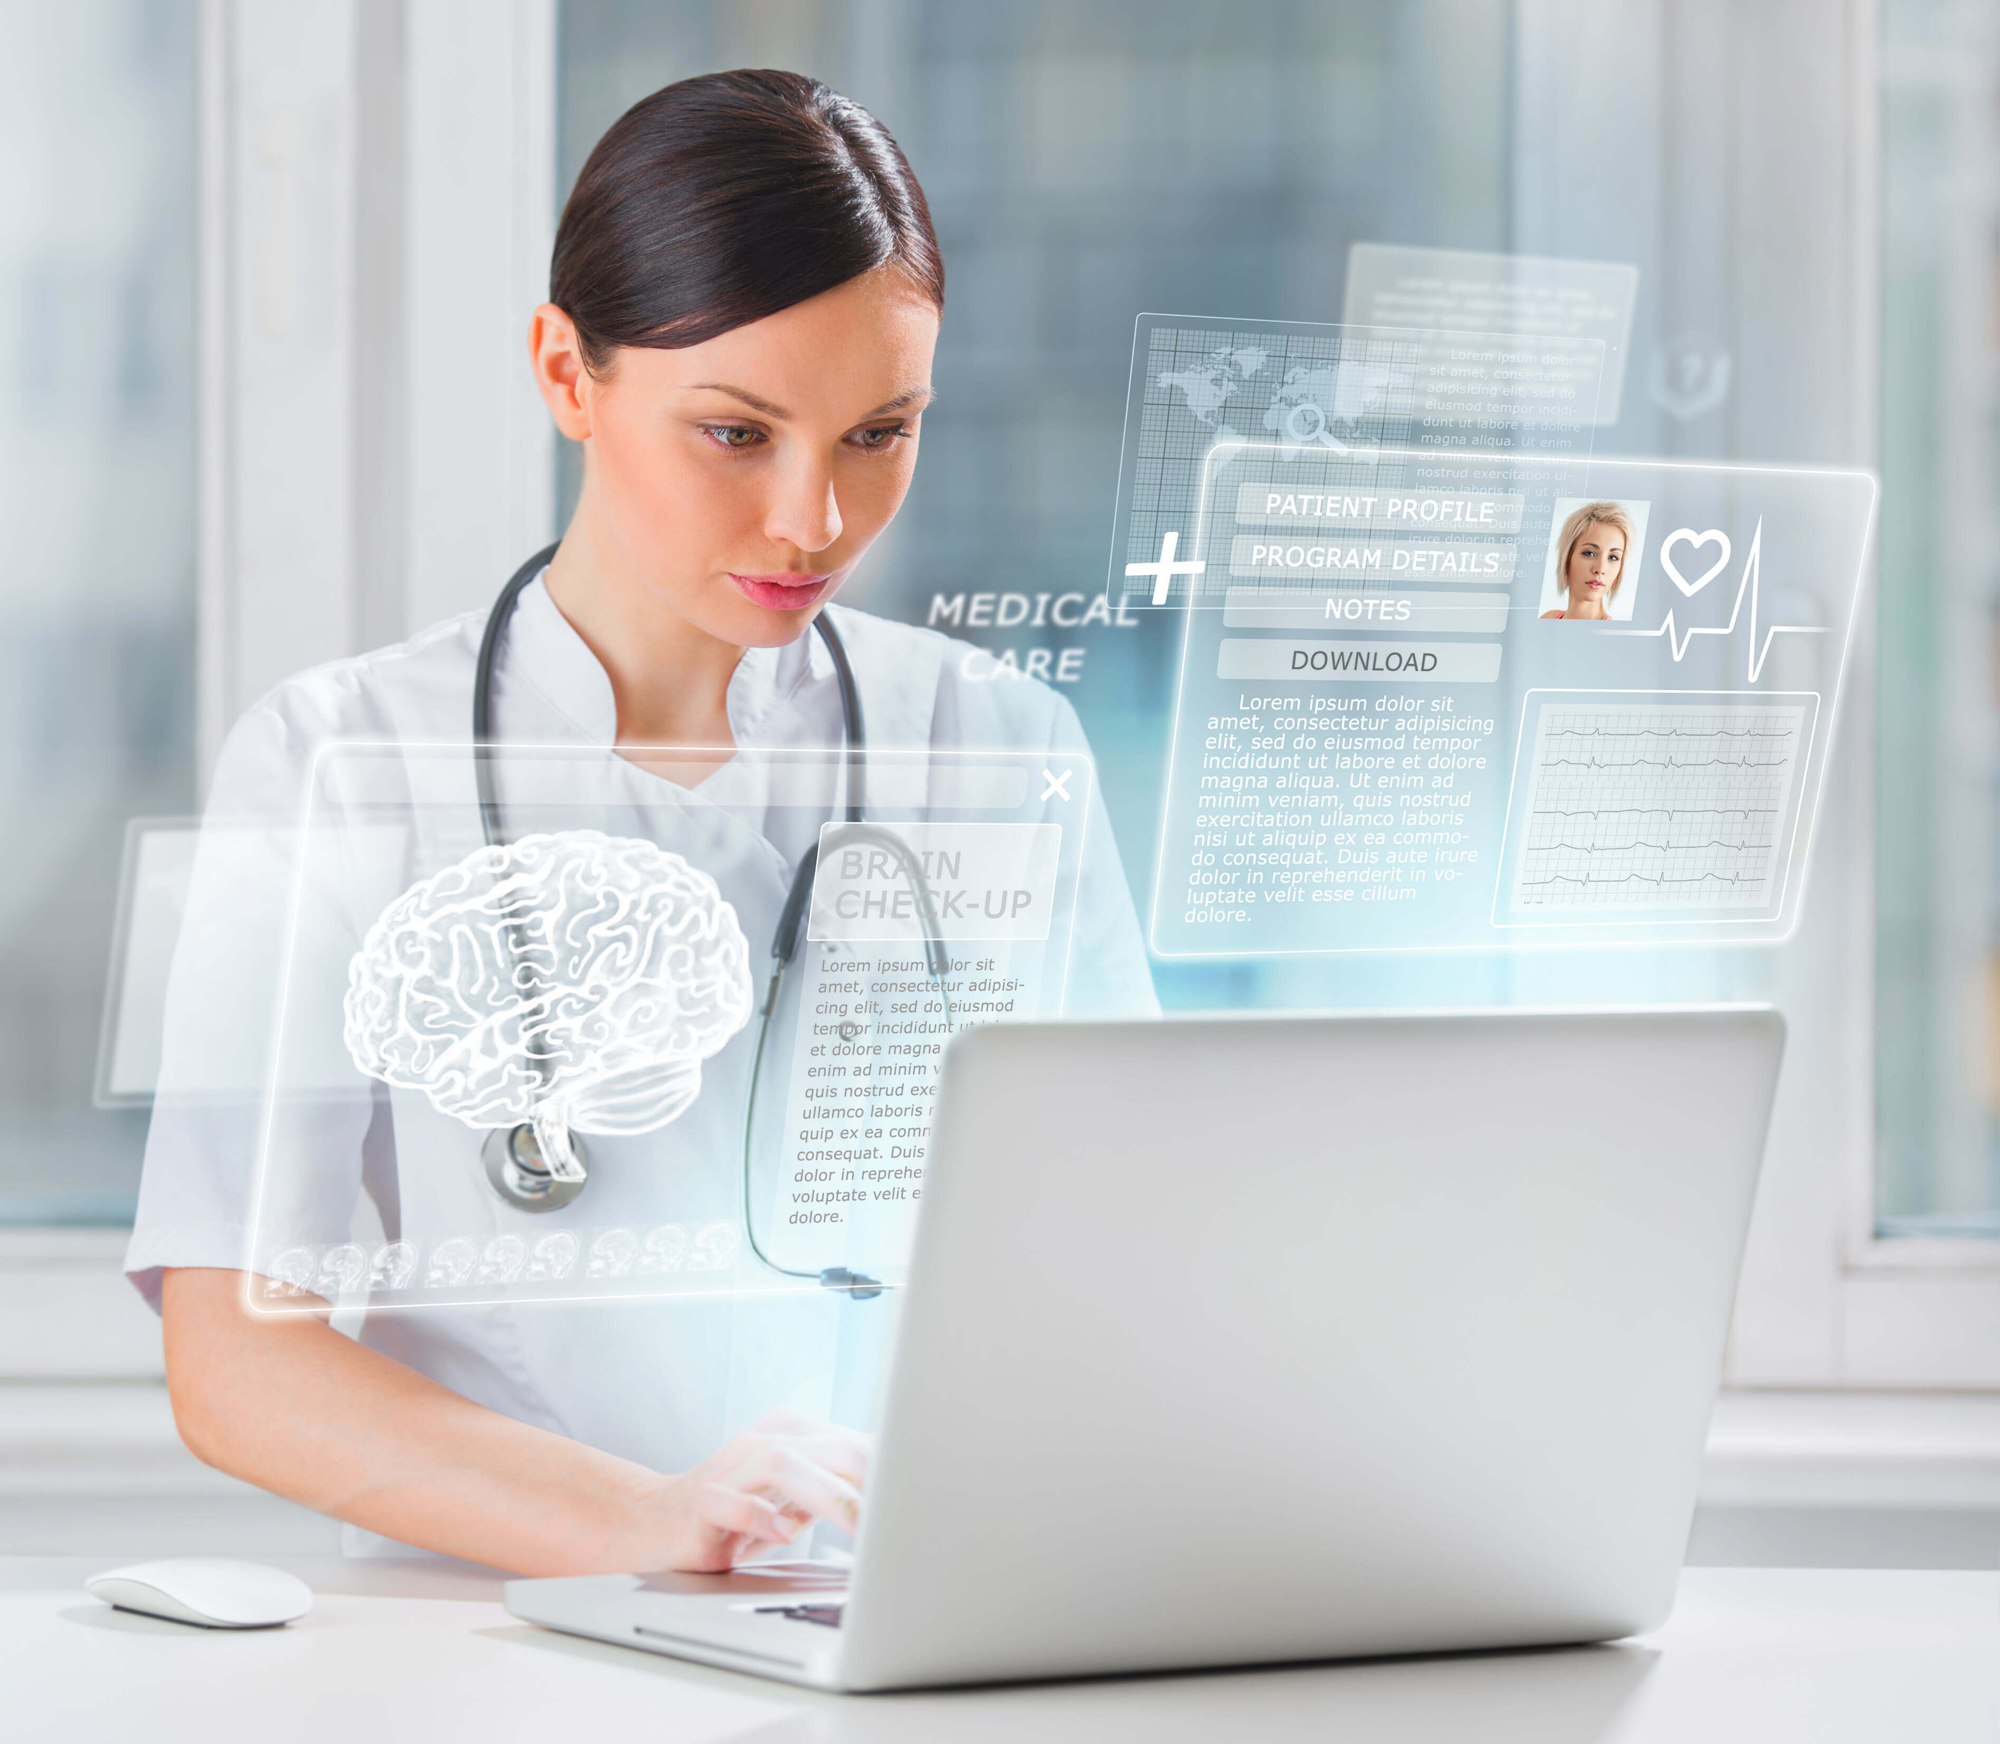 EMR, Electronic Medical Record, EHR, Electronic Health Record, HIPAA, Scanning Medical Records, Thomasville, Tallahassee, Albany, Valdosta, Tifton, Dothan, Jacksonville, Atlanta, AHIMA, GHIMA, FHIMA